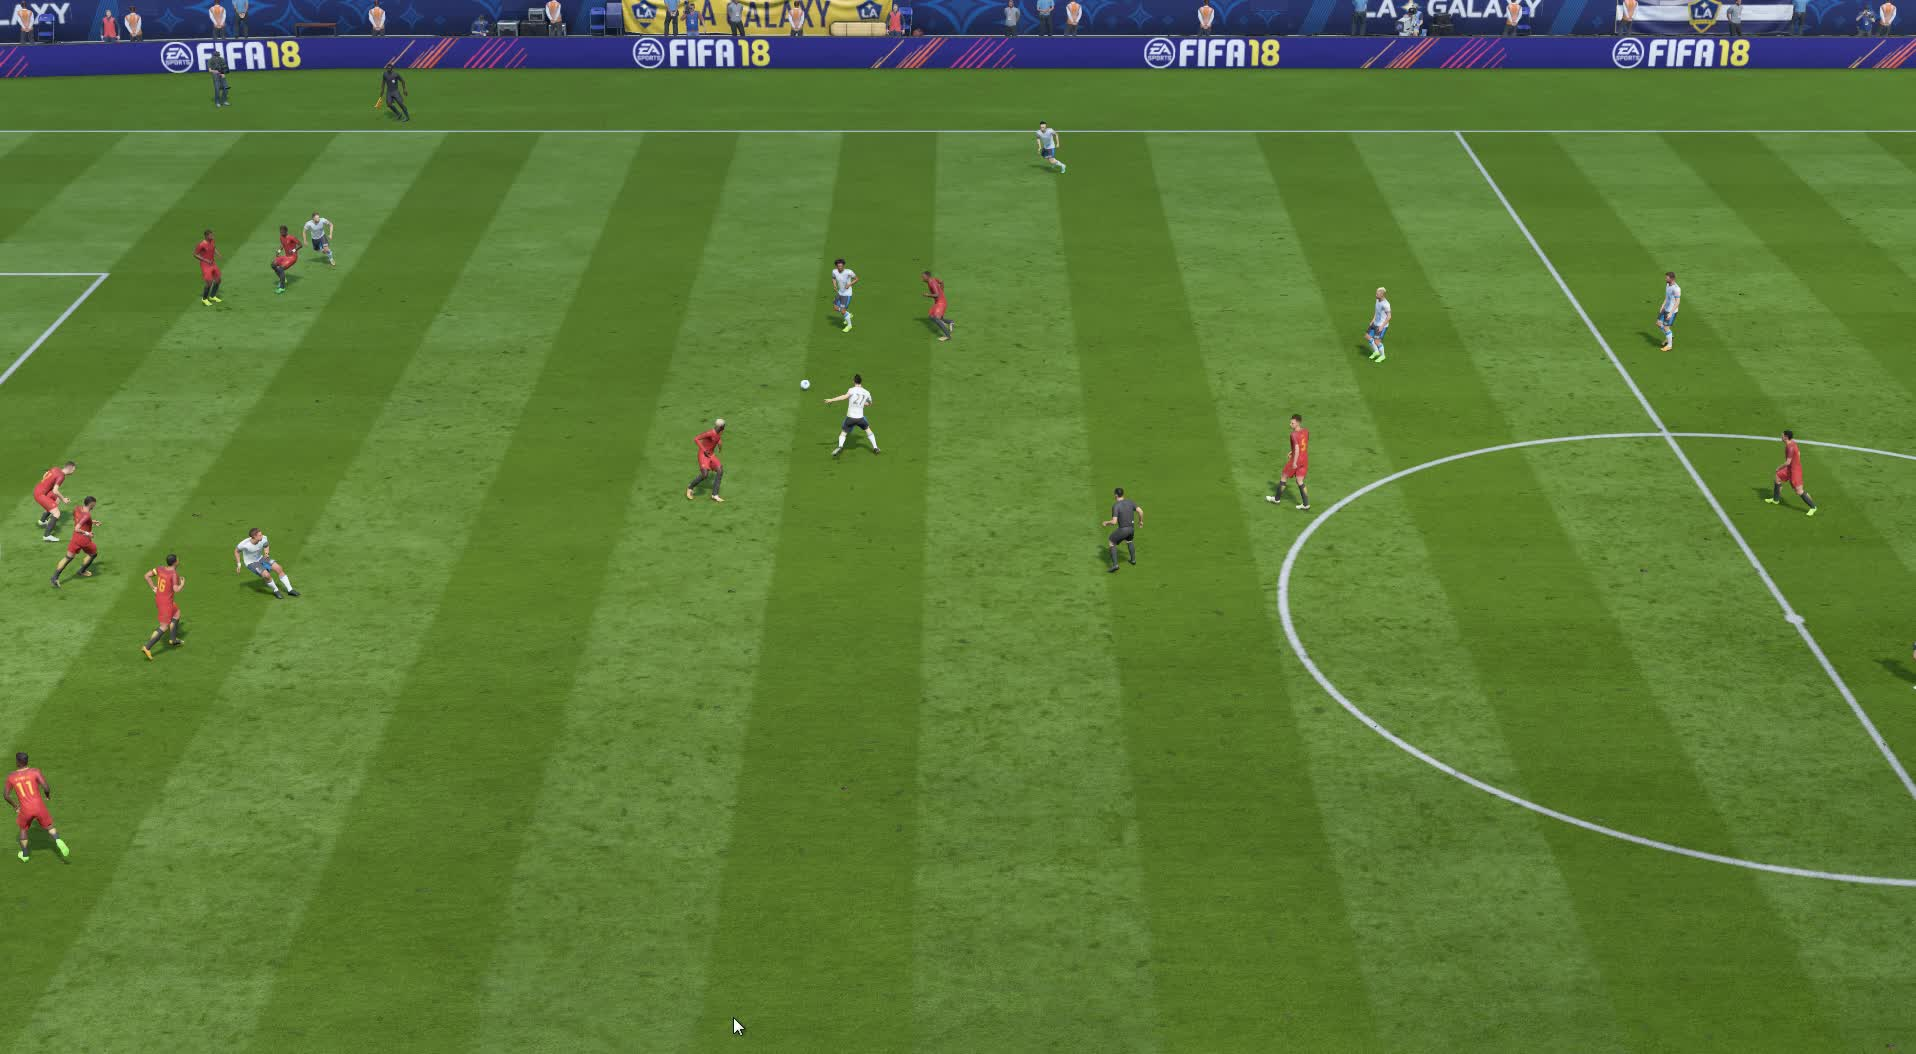 fifa, fifa 18, FIFA 18 FTC Hamsik (Cuadrado) GIFs